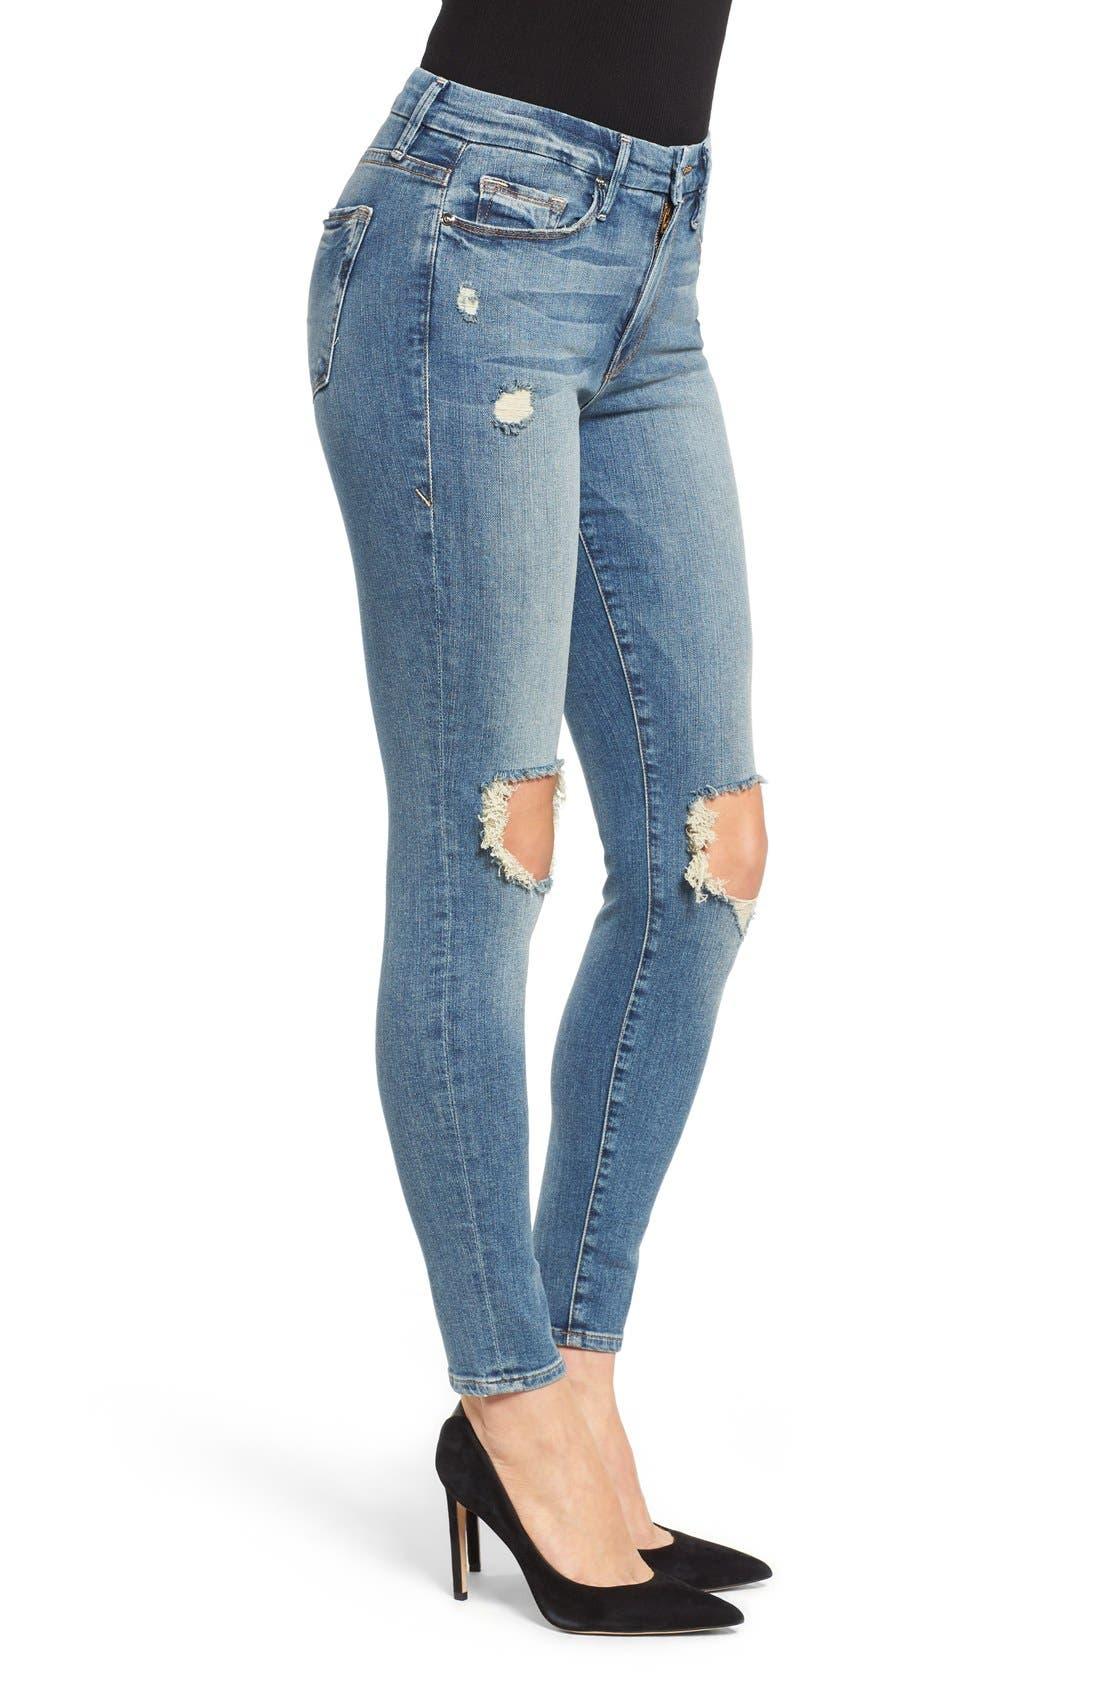 Alternate Image 3  - Good American Good Legs High Rise Ripped Skinny Jeans (Blue 006)